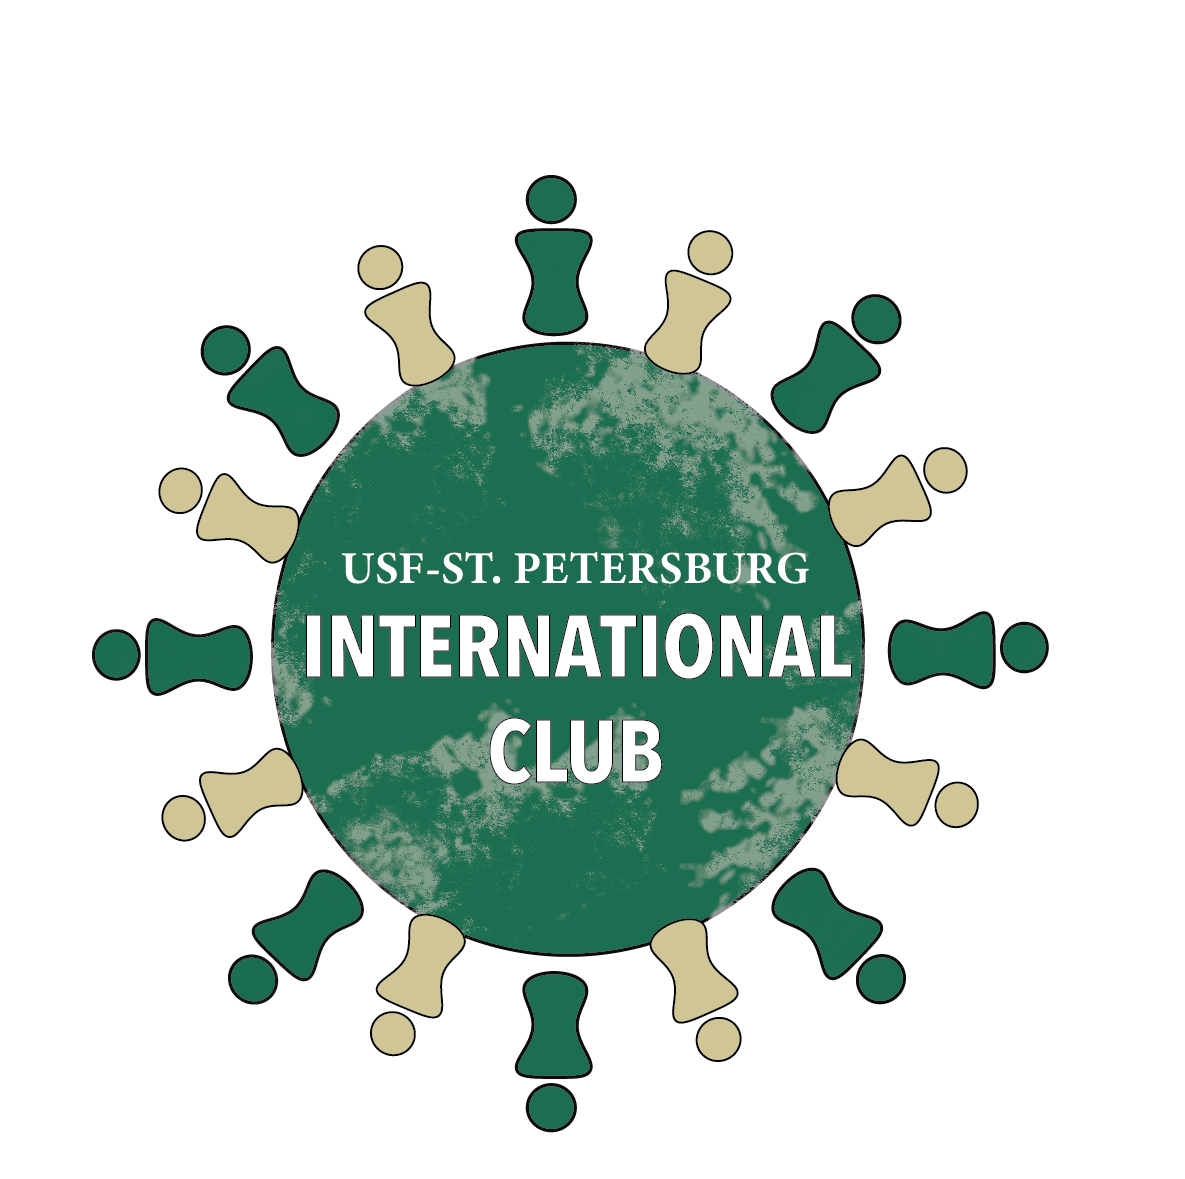 Global Initiatives – USFSP